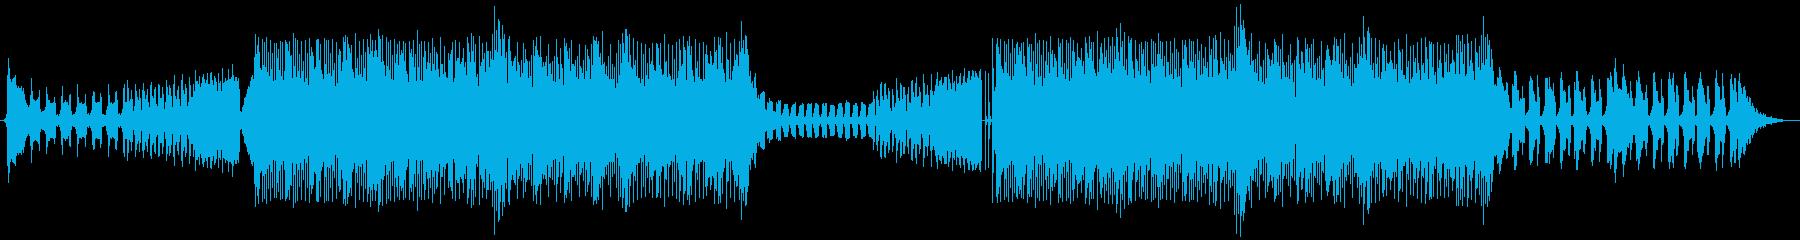 eスポーツ 大会 EDM オケの再生済みの波形